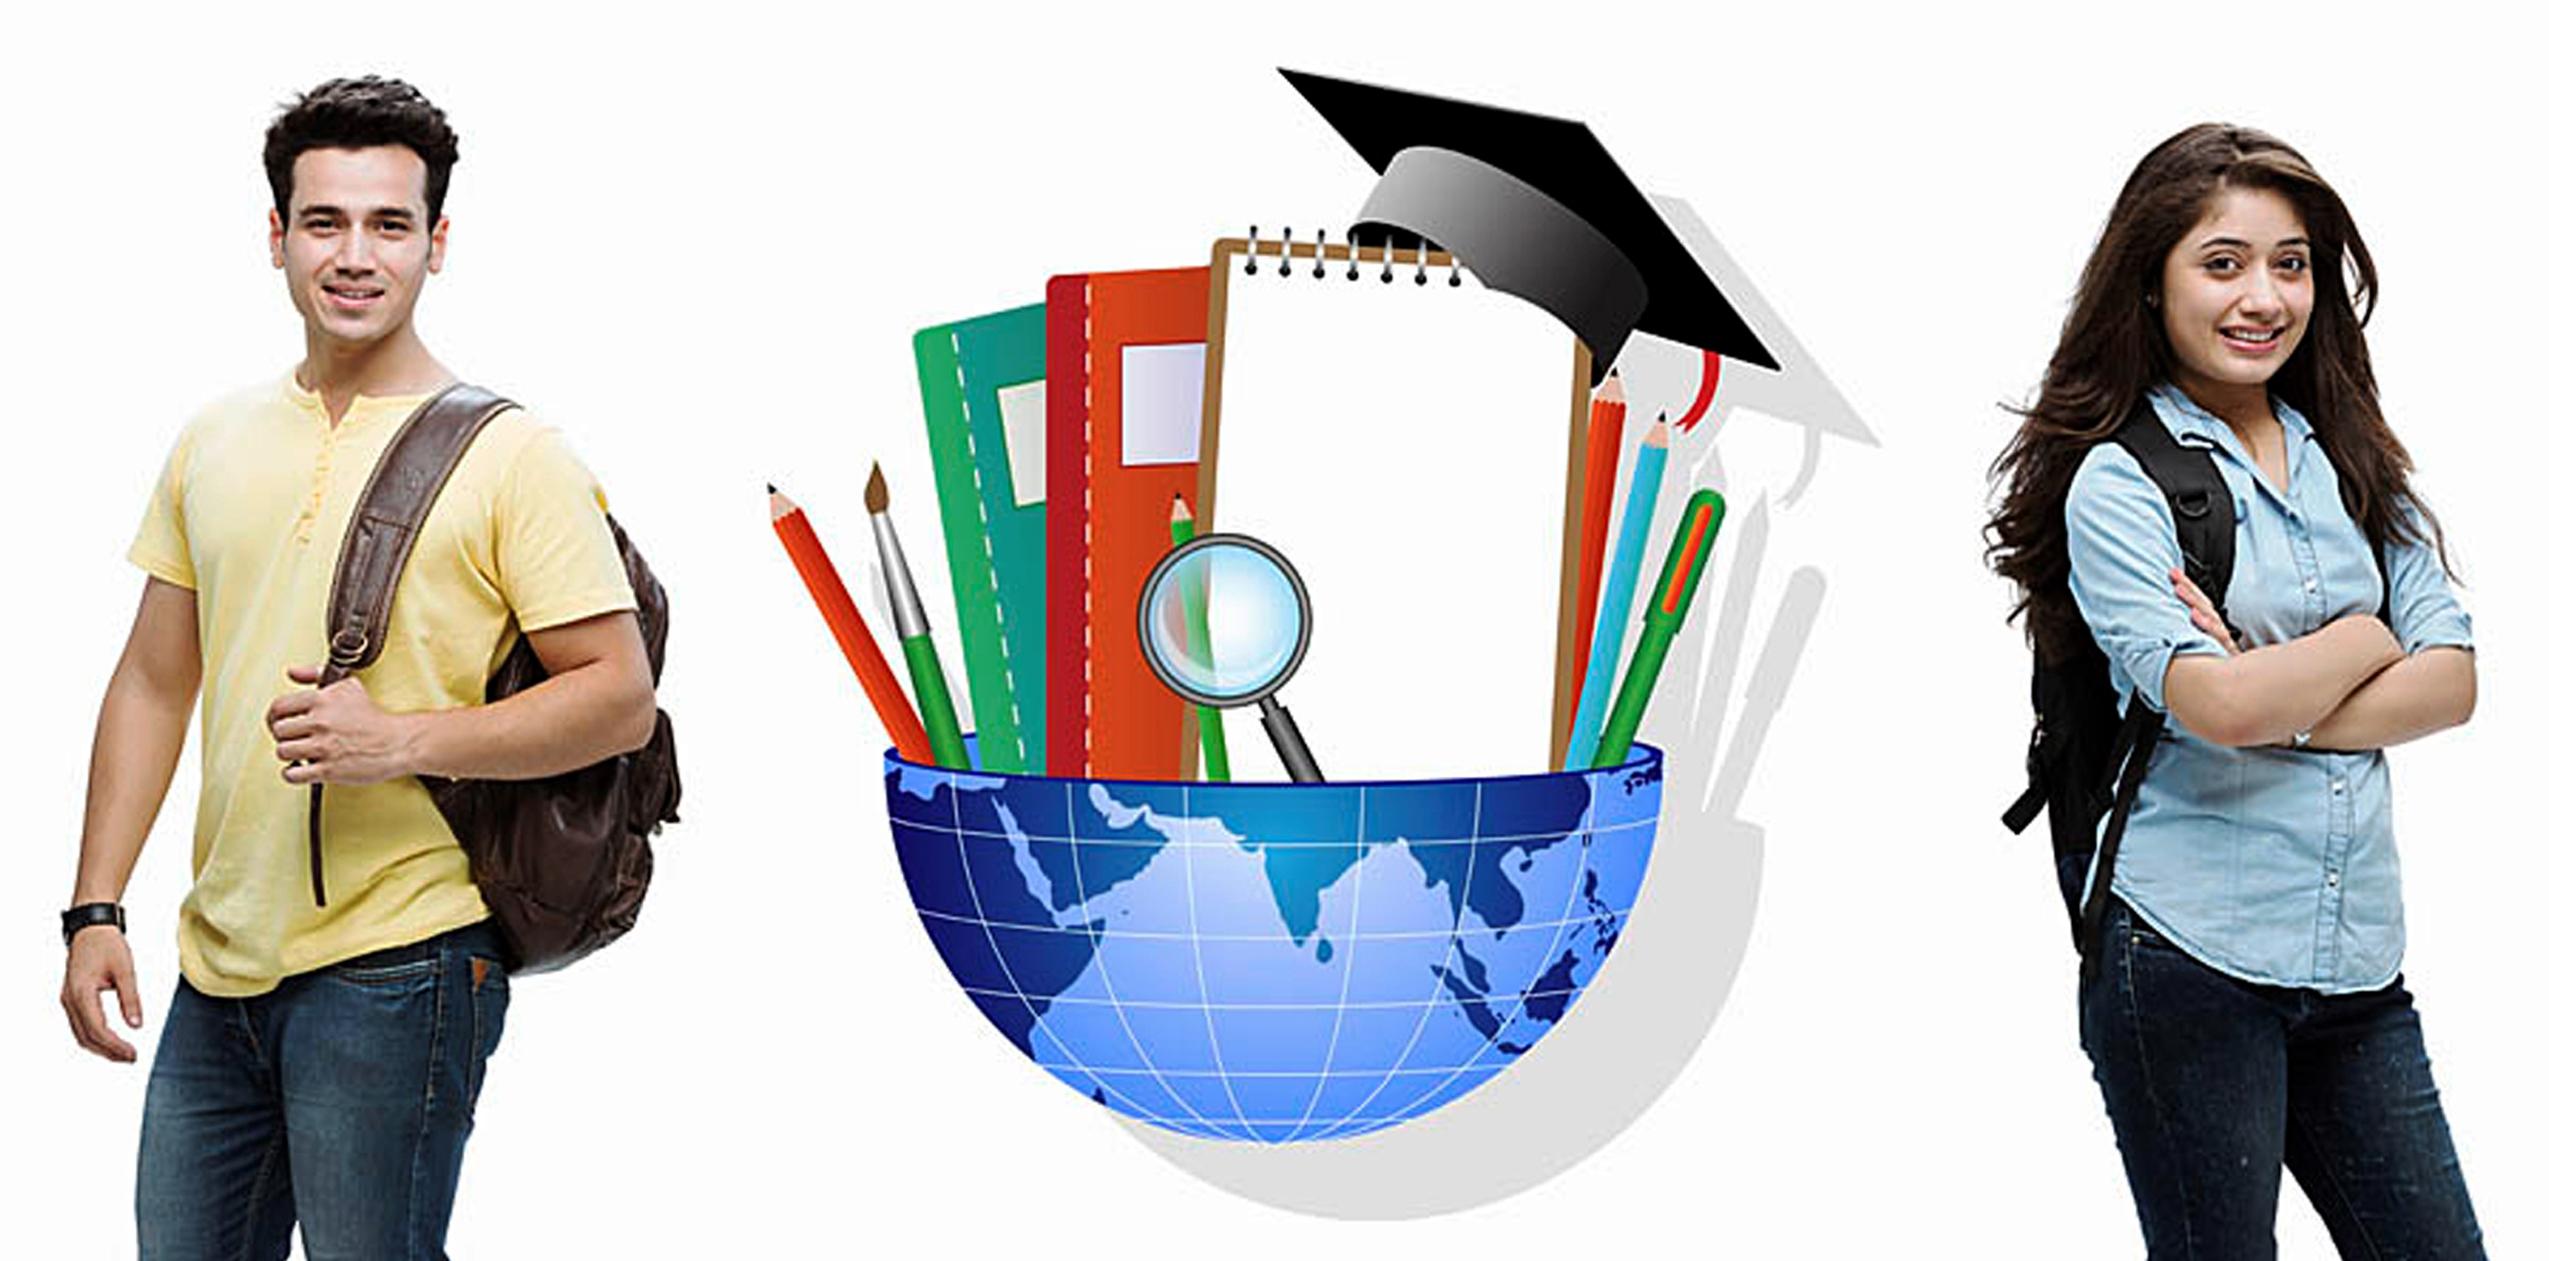 higher education, undergraduate, professional, degree